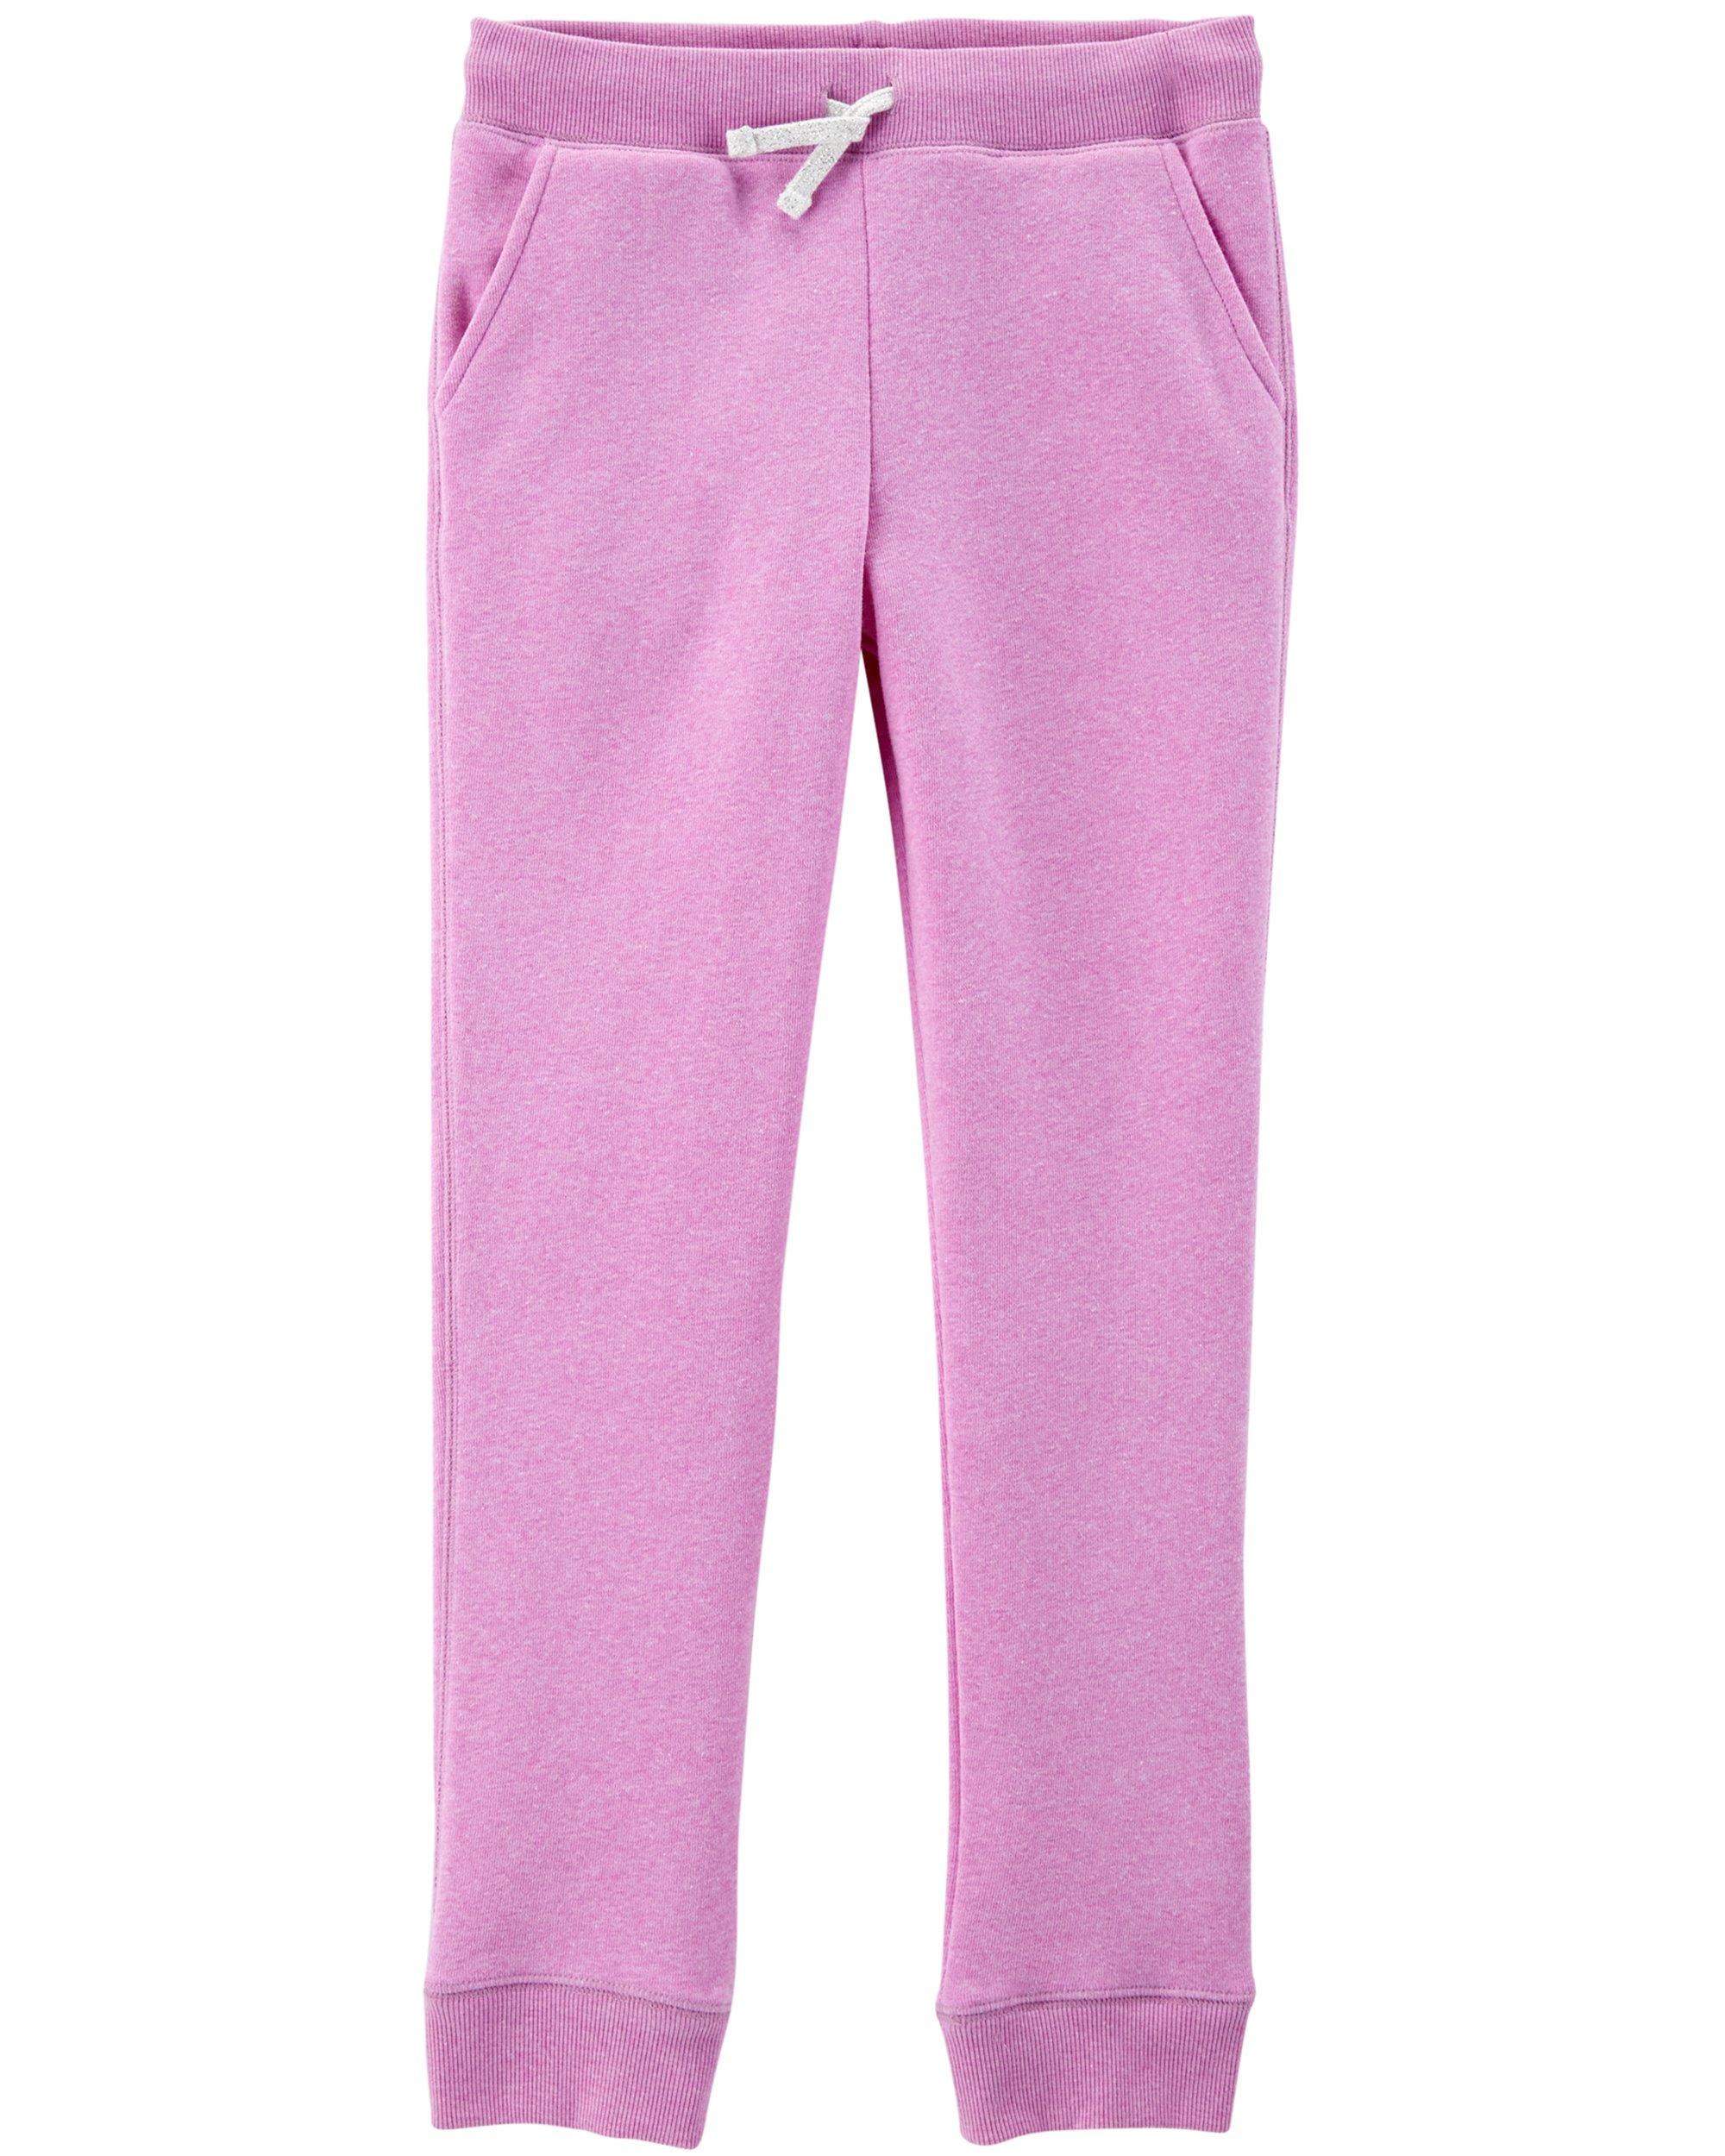 OshKosh B'Gosh Girls' Kids Fleece Jogger Pants, Lilac, 10-12